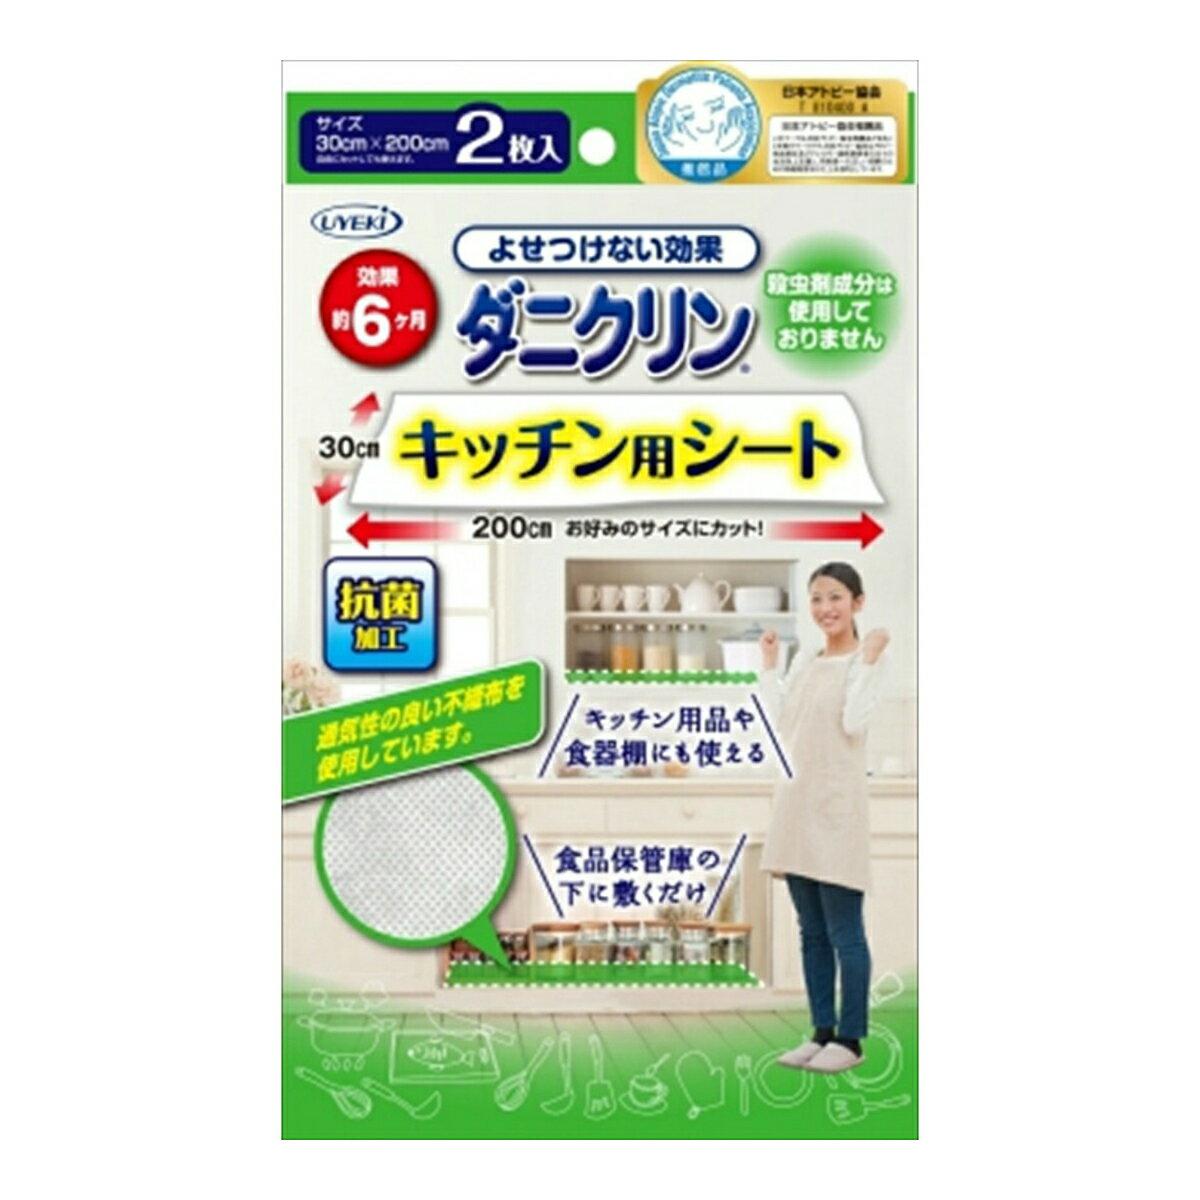 【UYEKI】【ダニクリン】ダニクリン キッチンシート 2枚入 ( 4968909057937 )